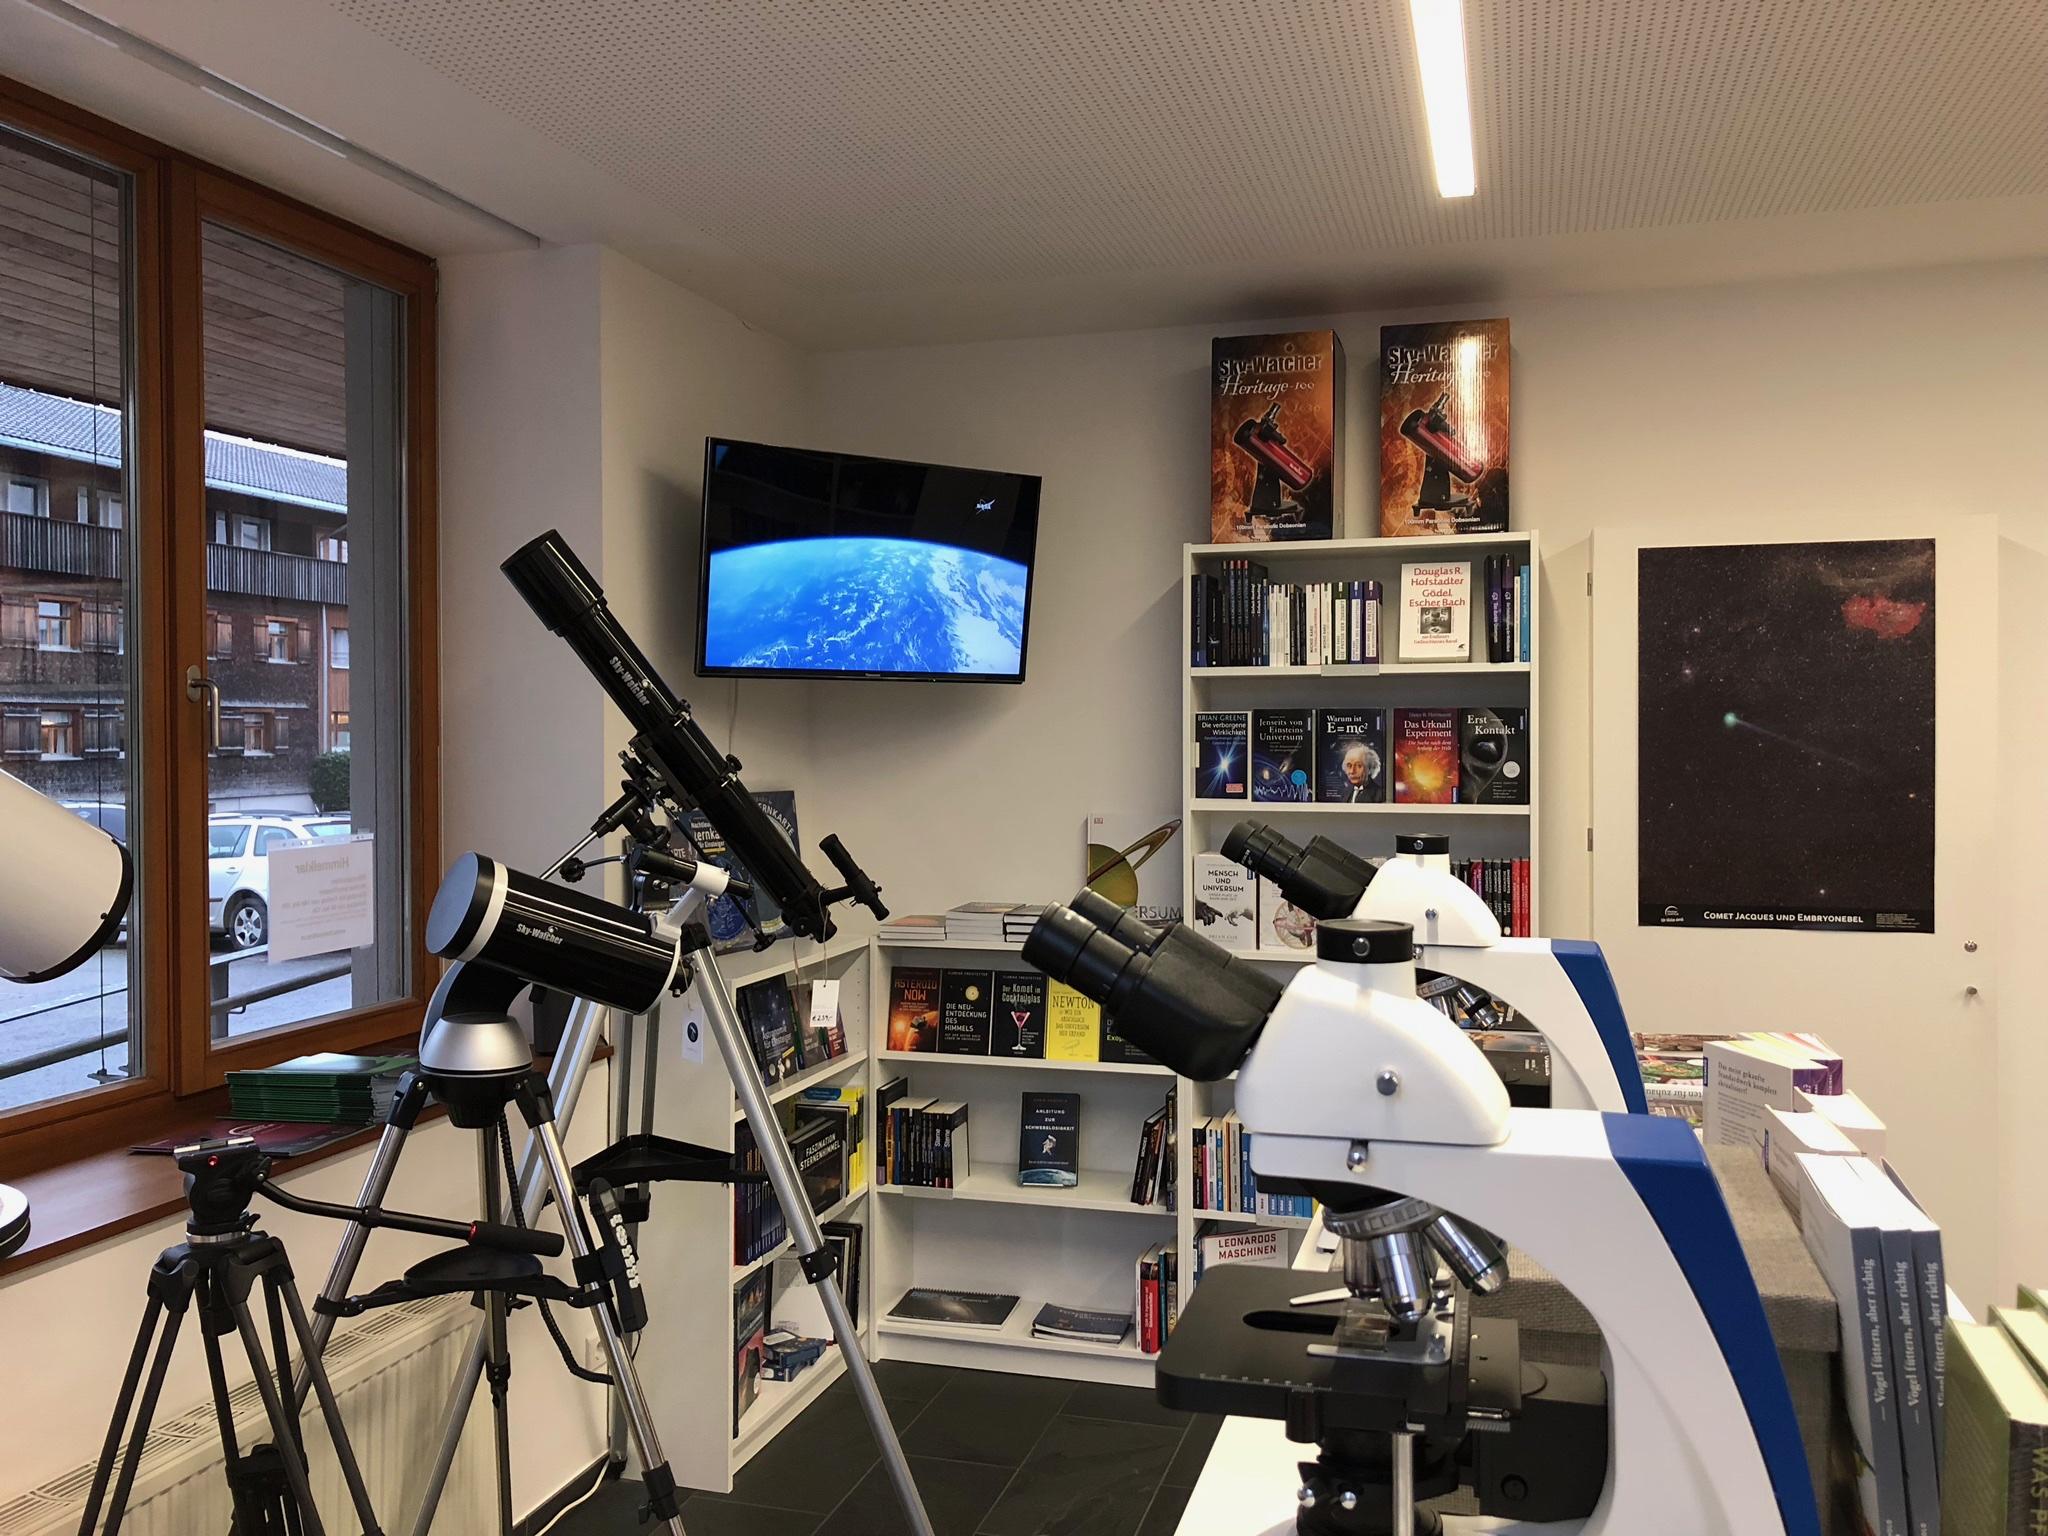 Teleskope und Mikroskope